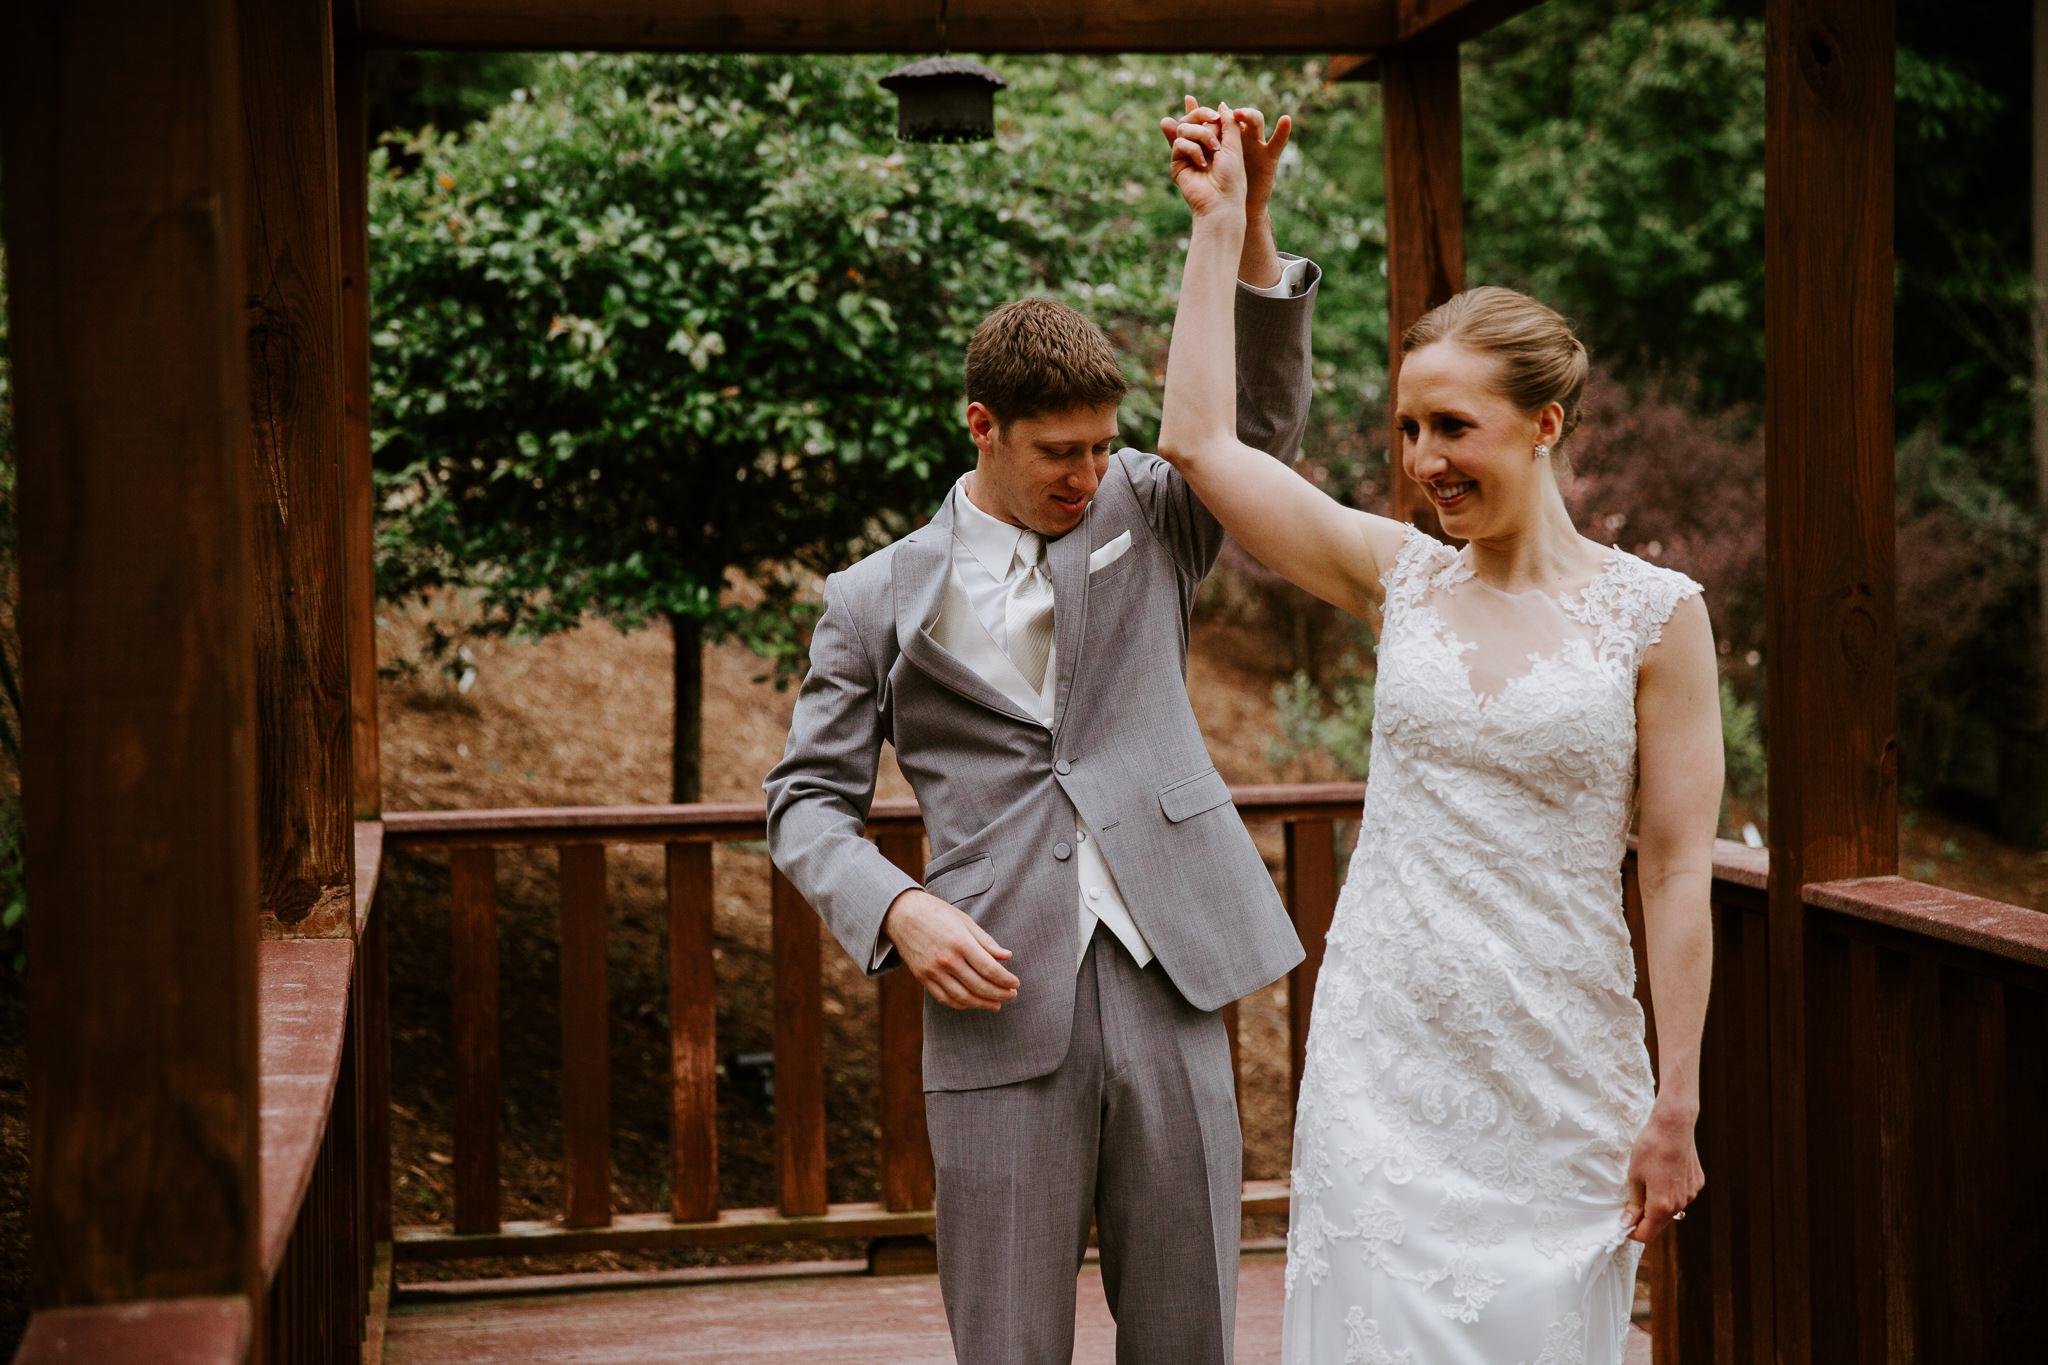 House Mountain Inn - Weddings - Lexington - Virginia - Best Wedding Photographer - Pat Cori Photography-25.jpg